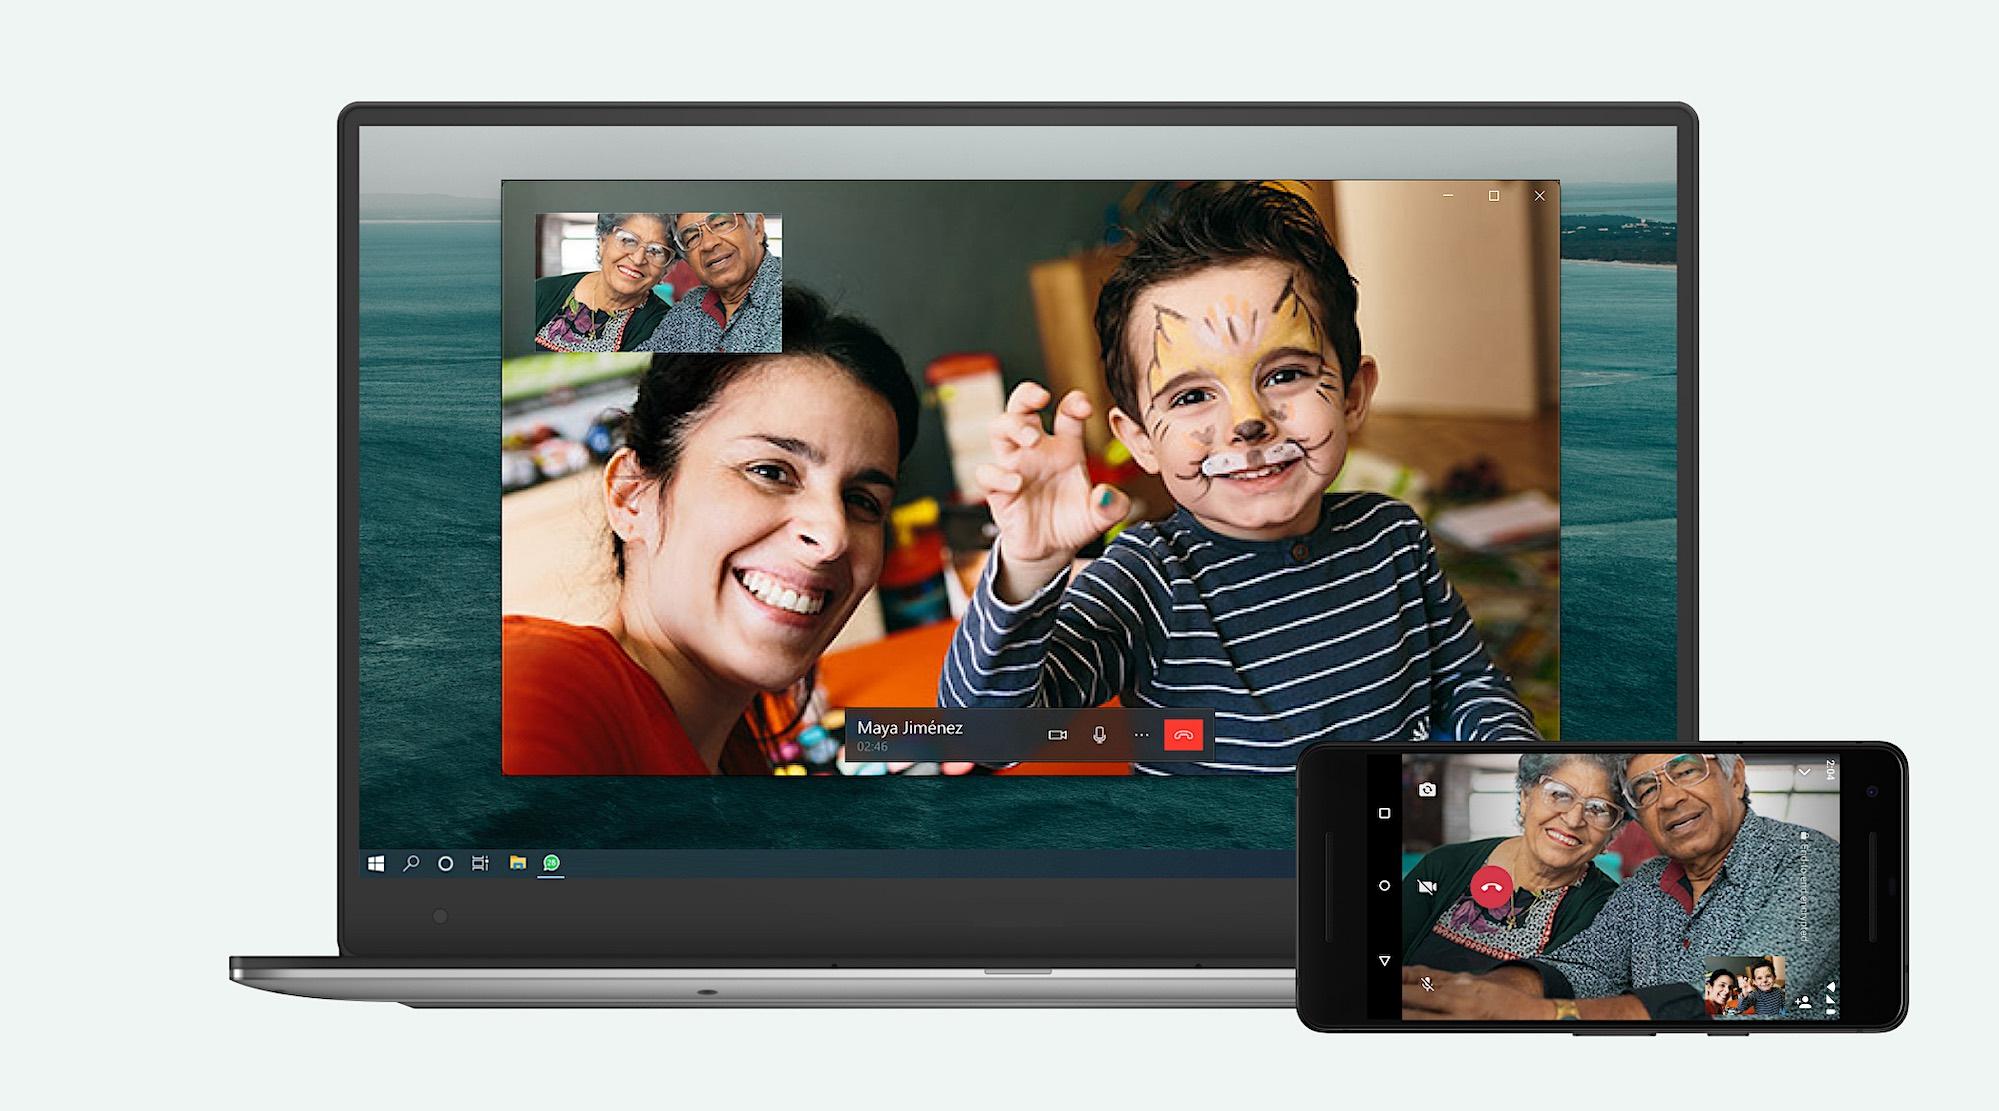 WhatsApp adds voice and video calling to desktop app | TechCrunch